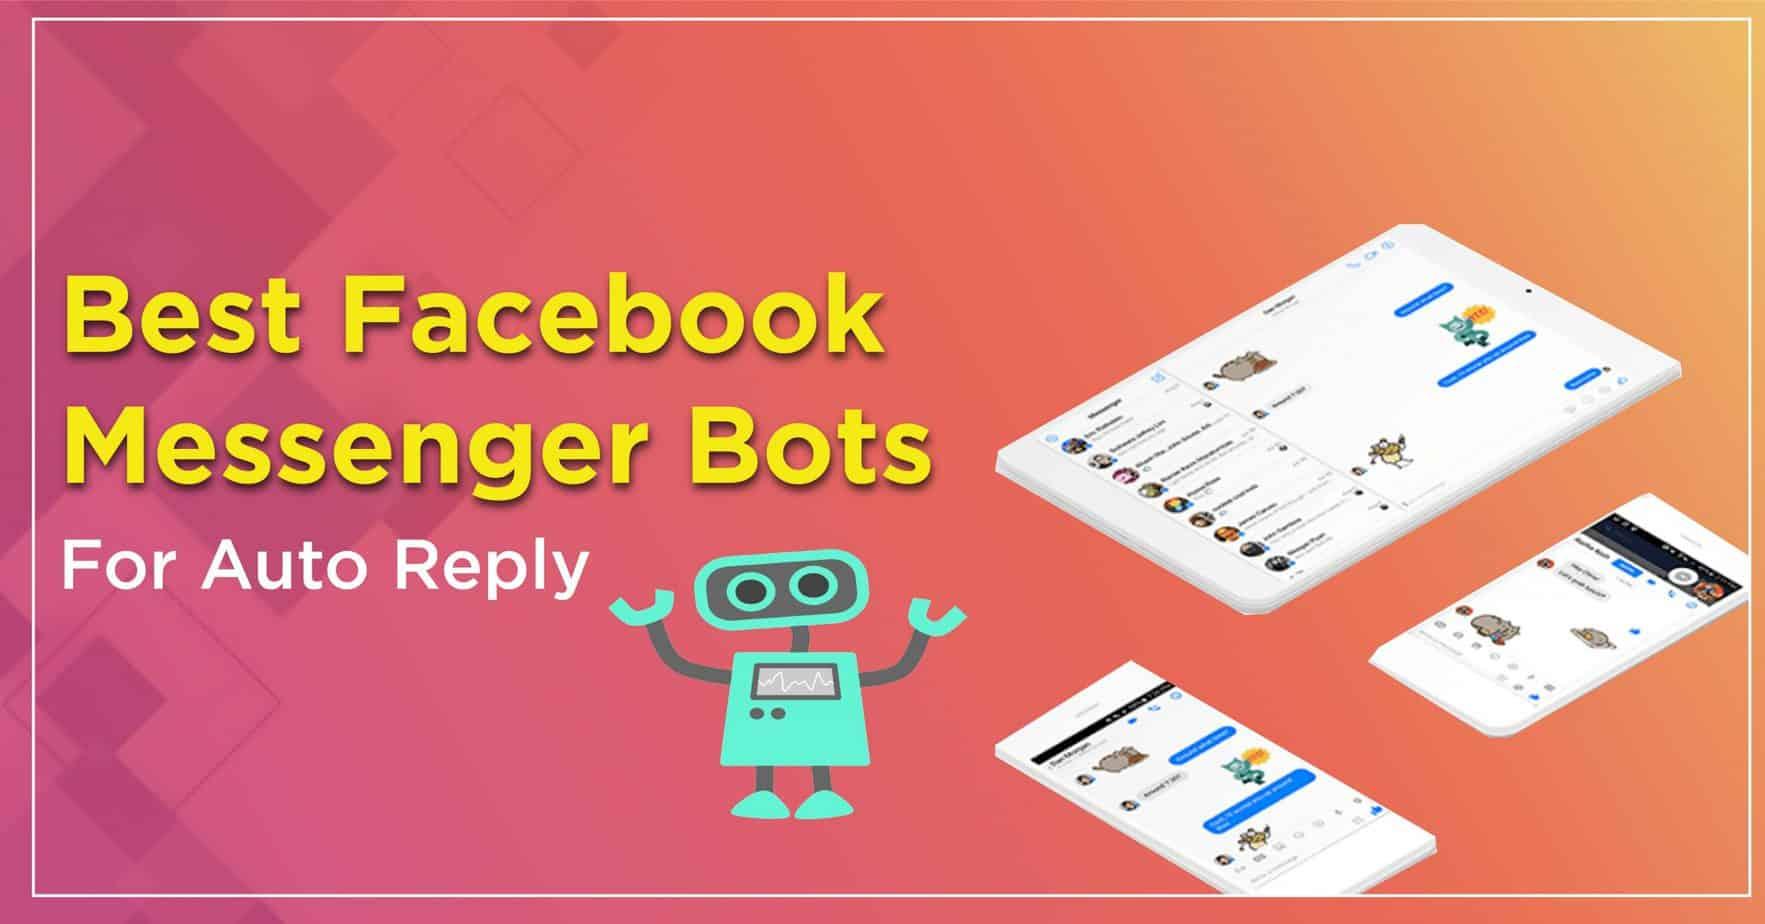 Best Facebook Messenger Auto Bot - One Search Pro Digital Marketing Agency